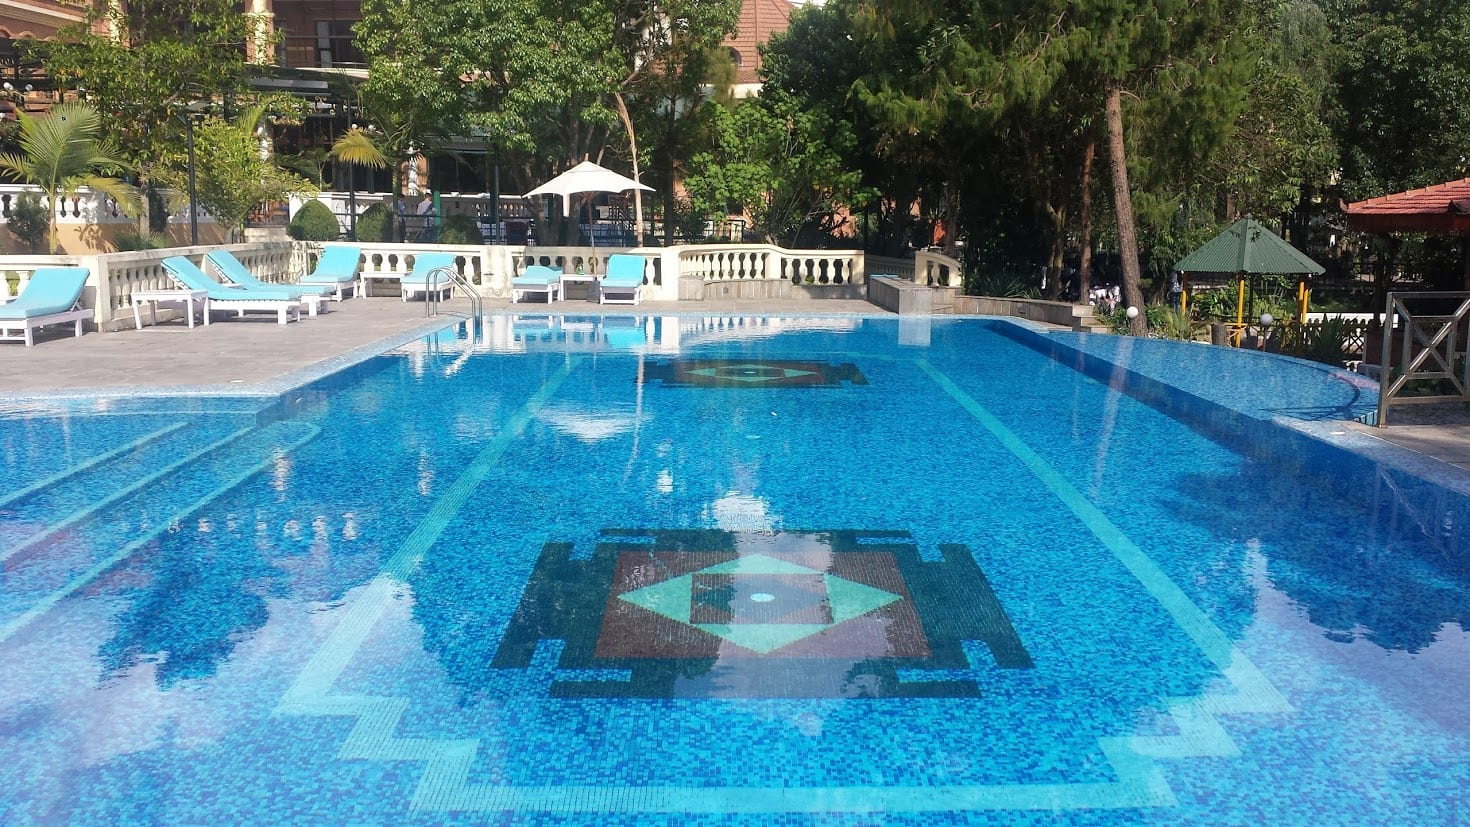 Park village resort swimming pool in Kathmandu